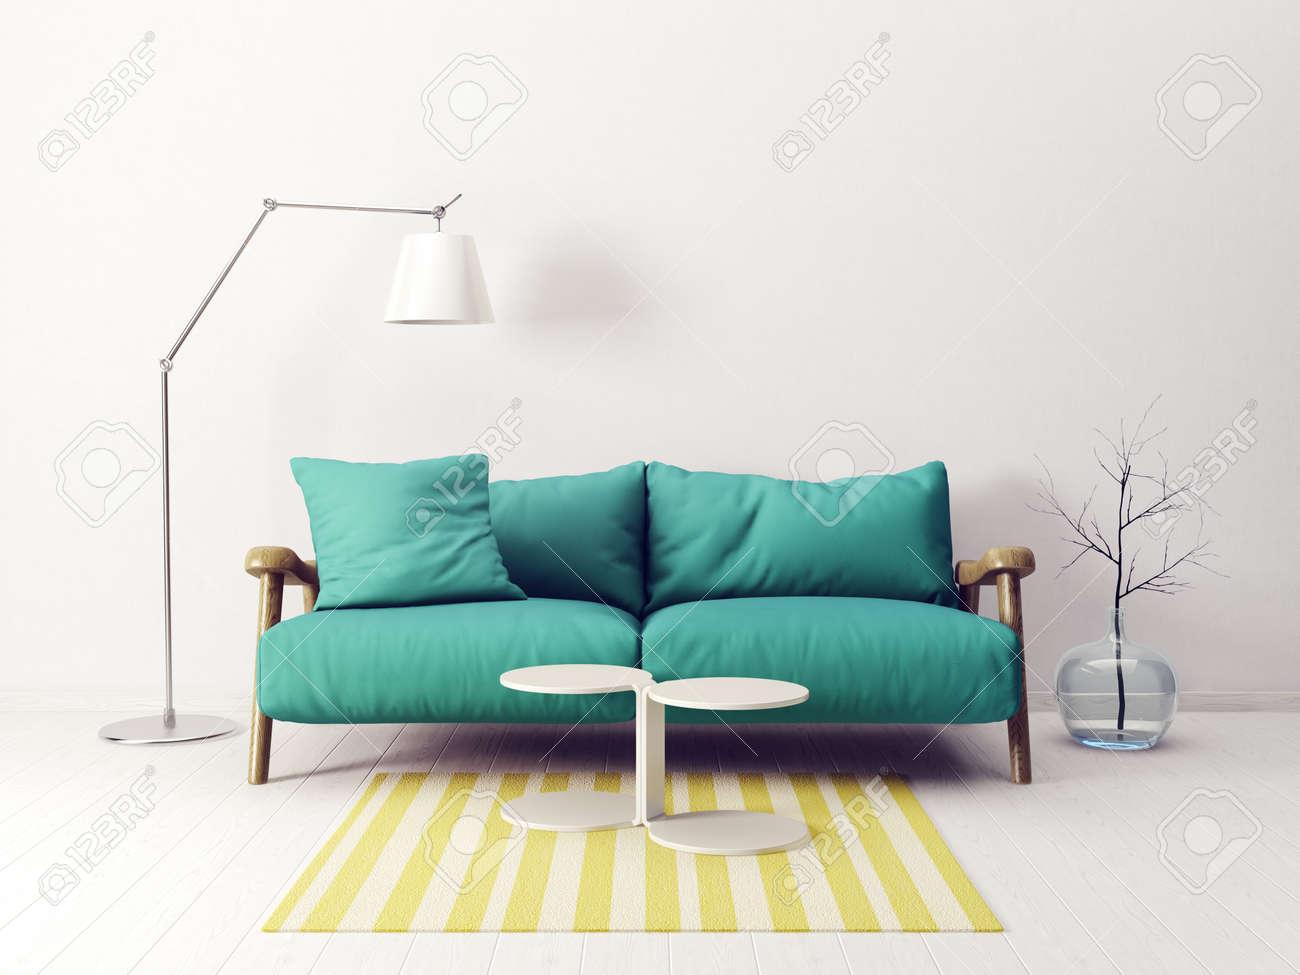 Modern Scandinavian Interior. Sofa In Living Room. 3d Render ...